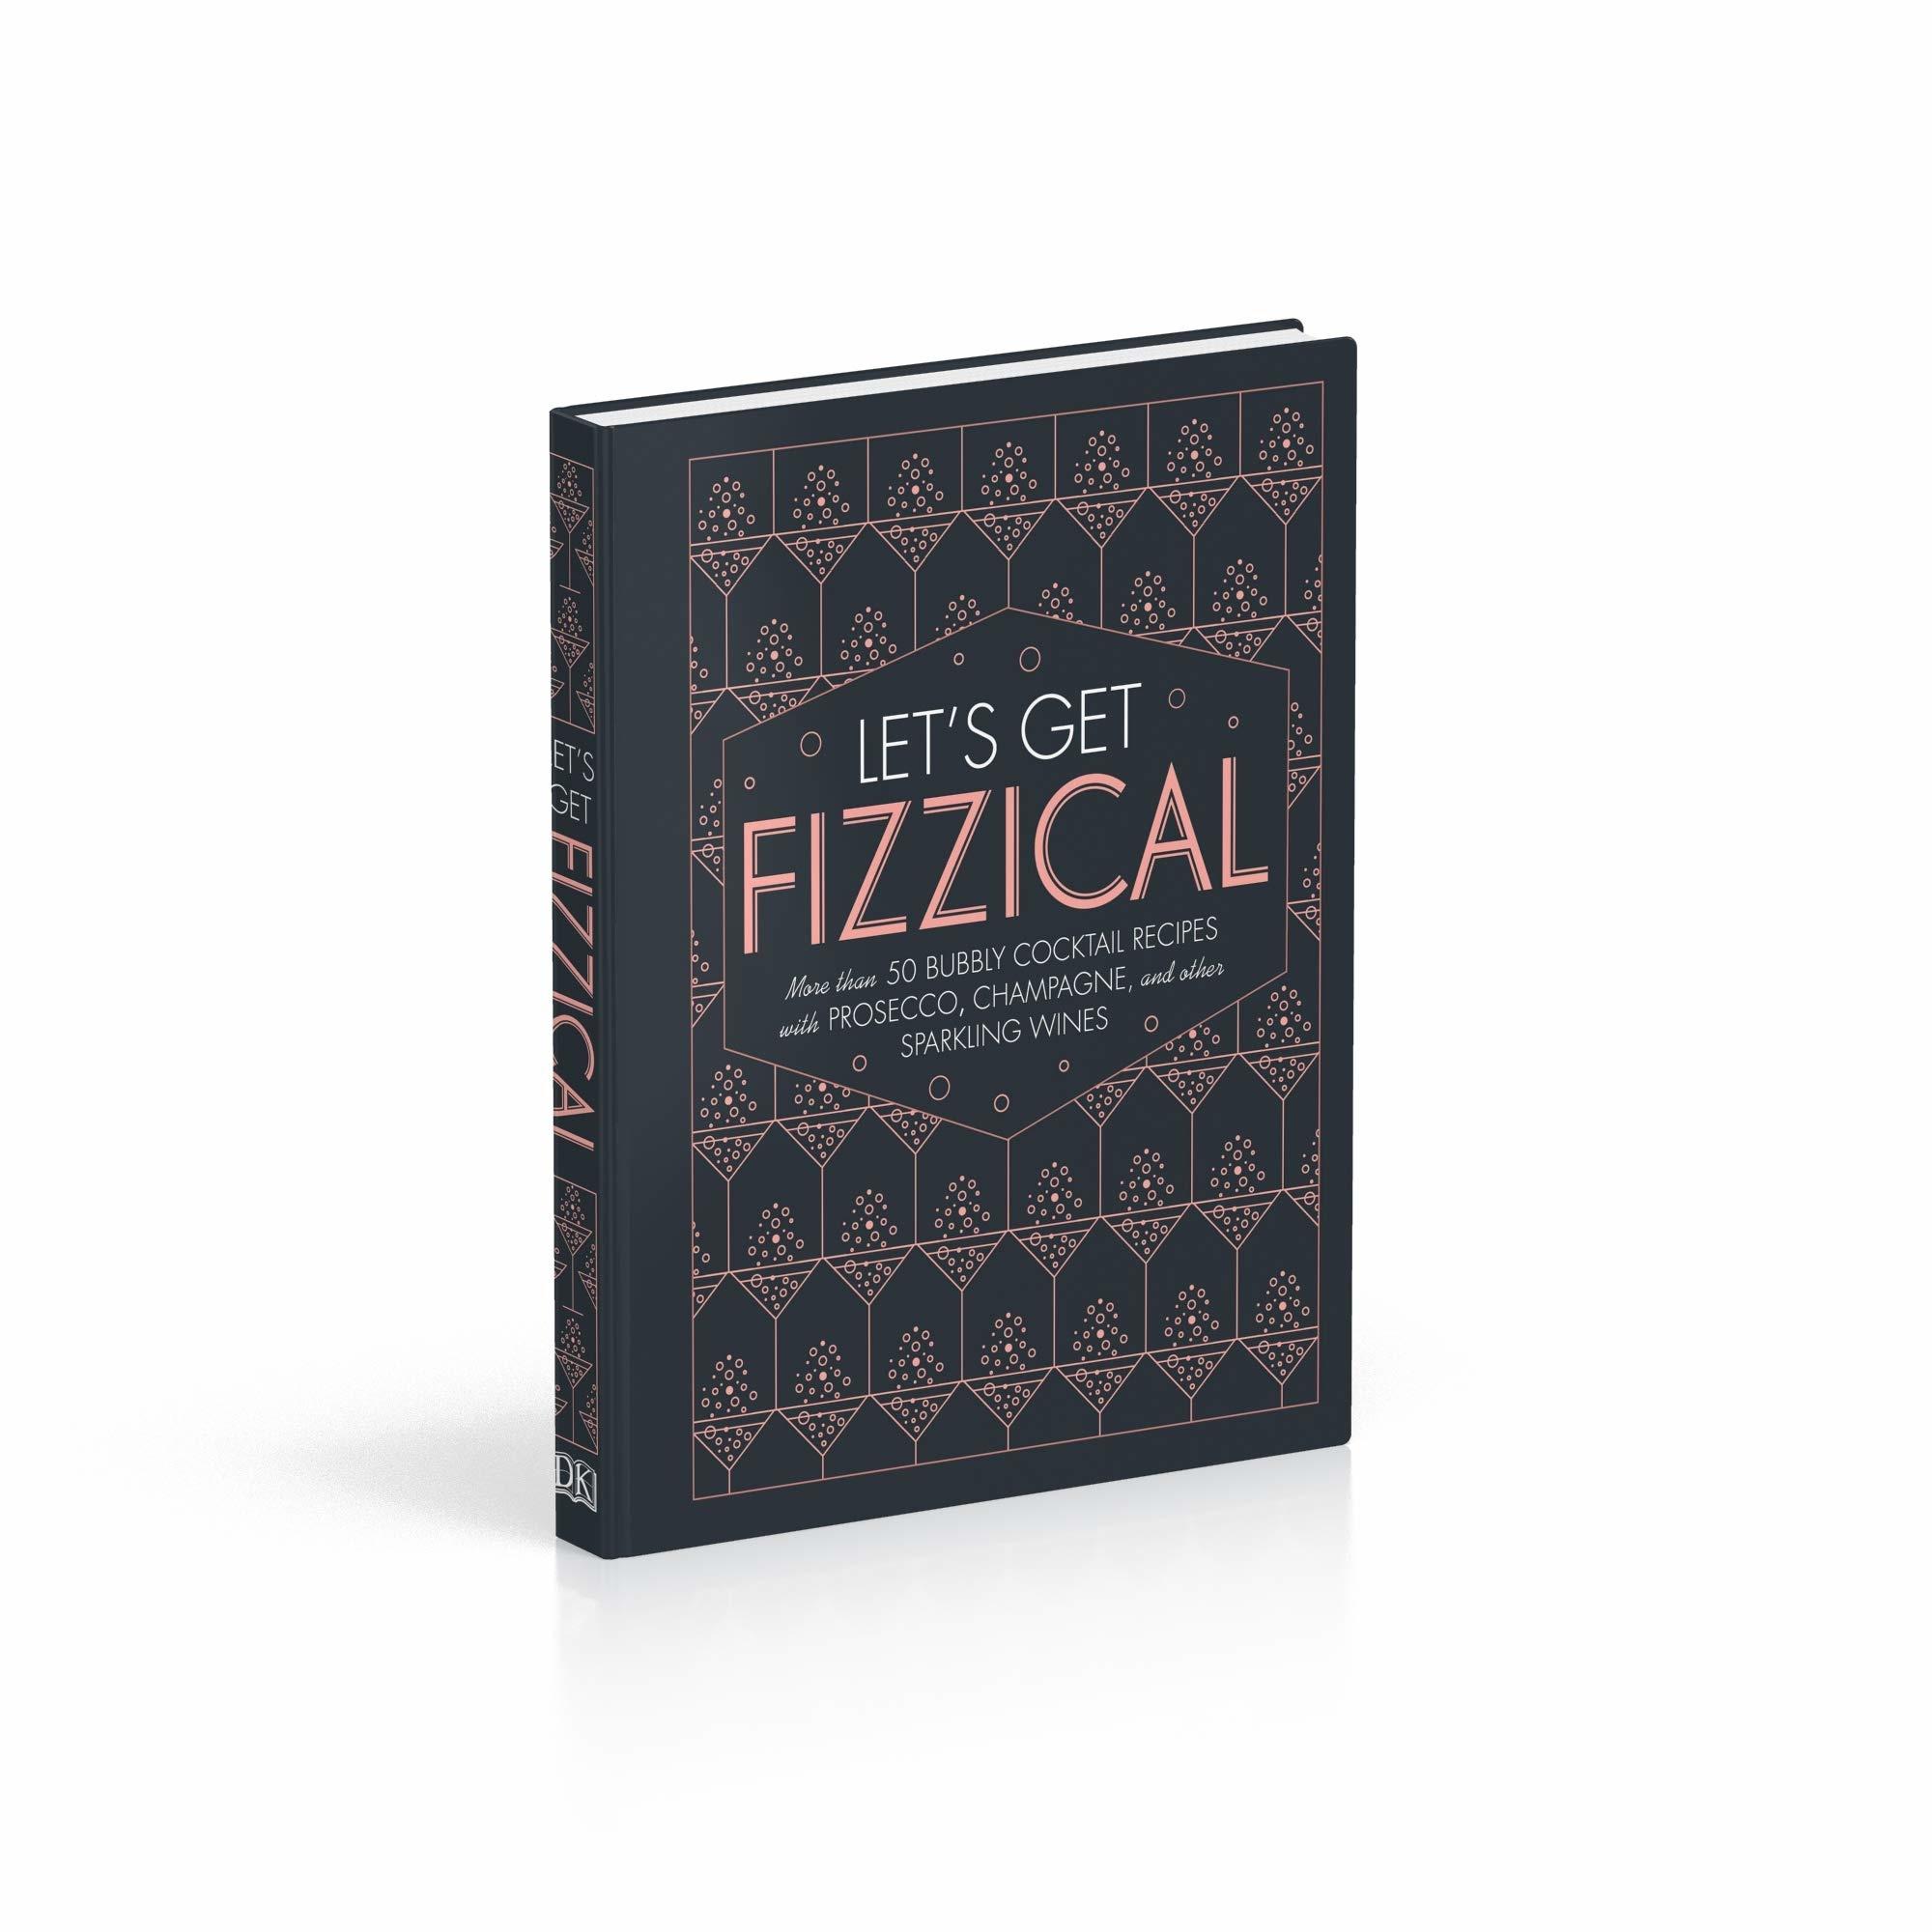 True Let's Get Fizzical Cocktail Book